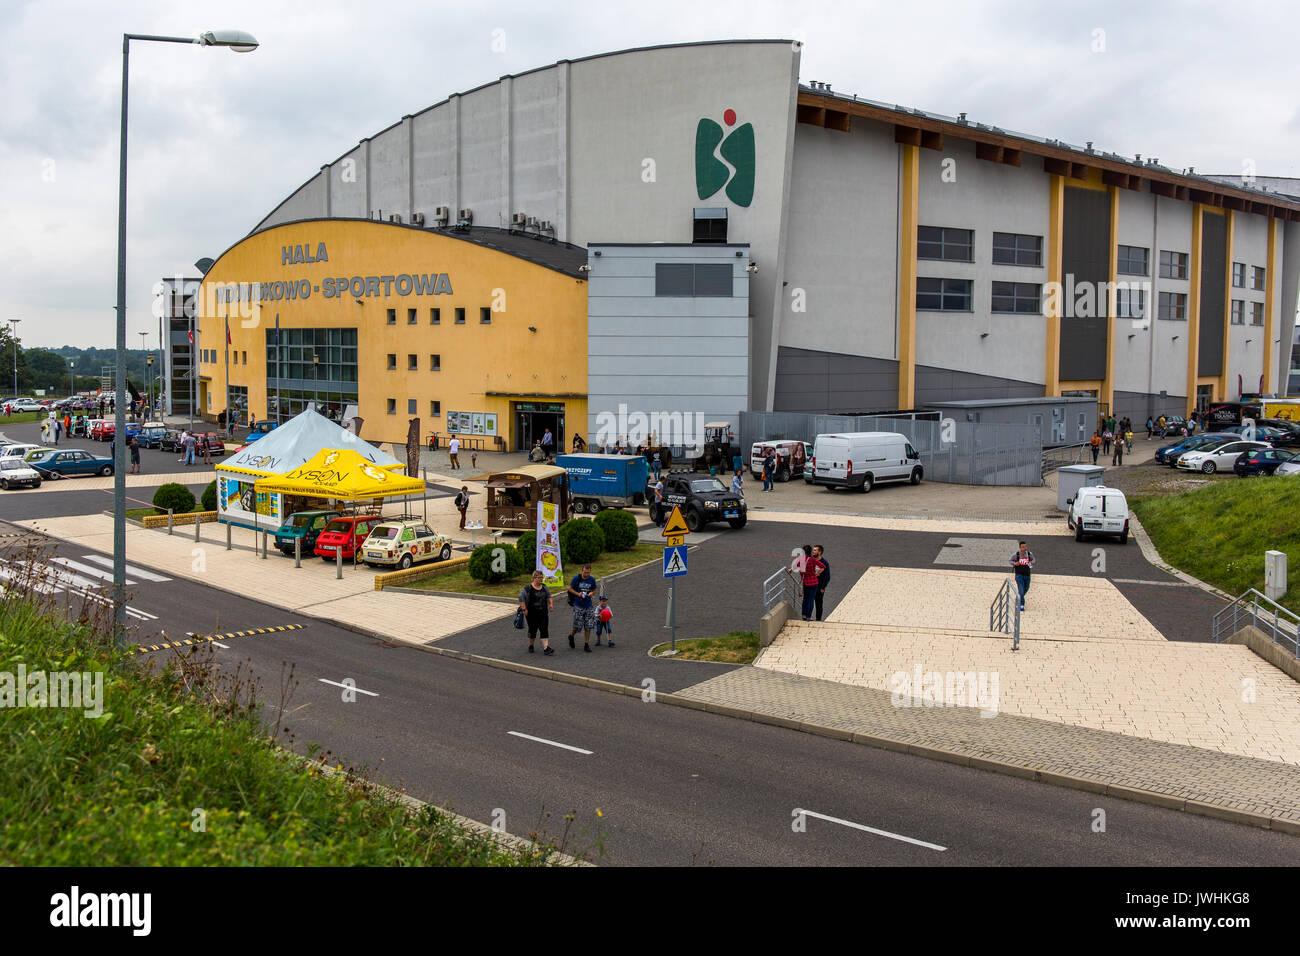 Bielsko-Biala, Poland. 12th Aug, 2017. International automotive trade fairs - MotoShow Bielsko-Biala. Main building. Credit: Lukasz Obermann/Alamy Live News - Stock Image